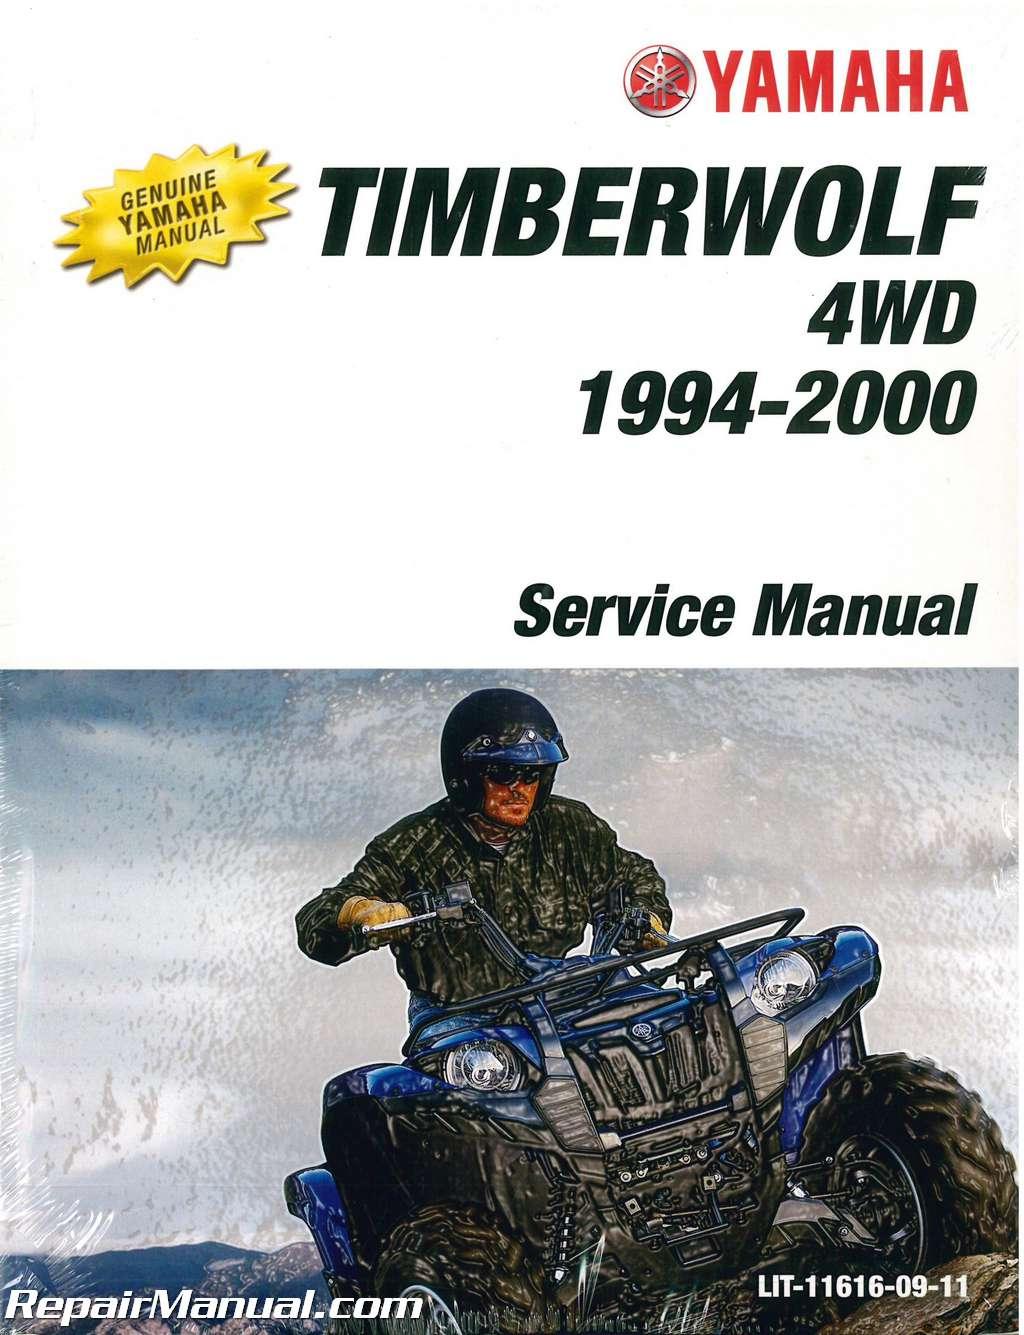 1994 2000 Yamaha YFB250FWF Timberwolf ATV Service Manual